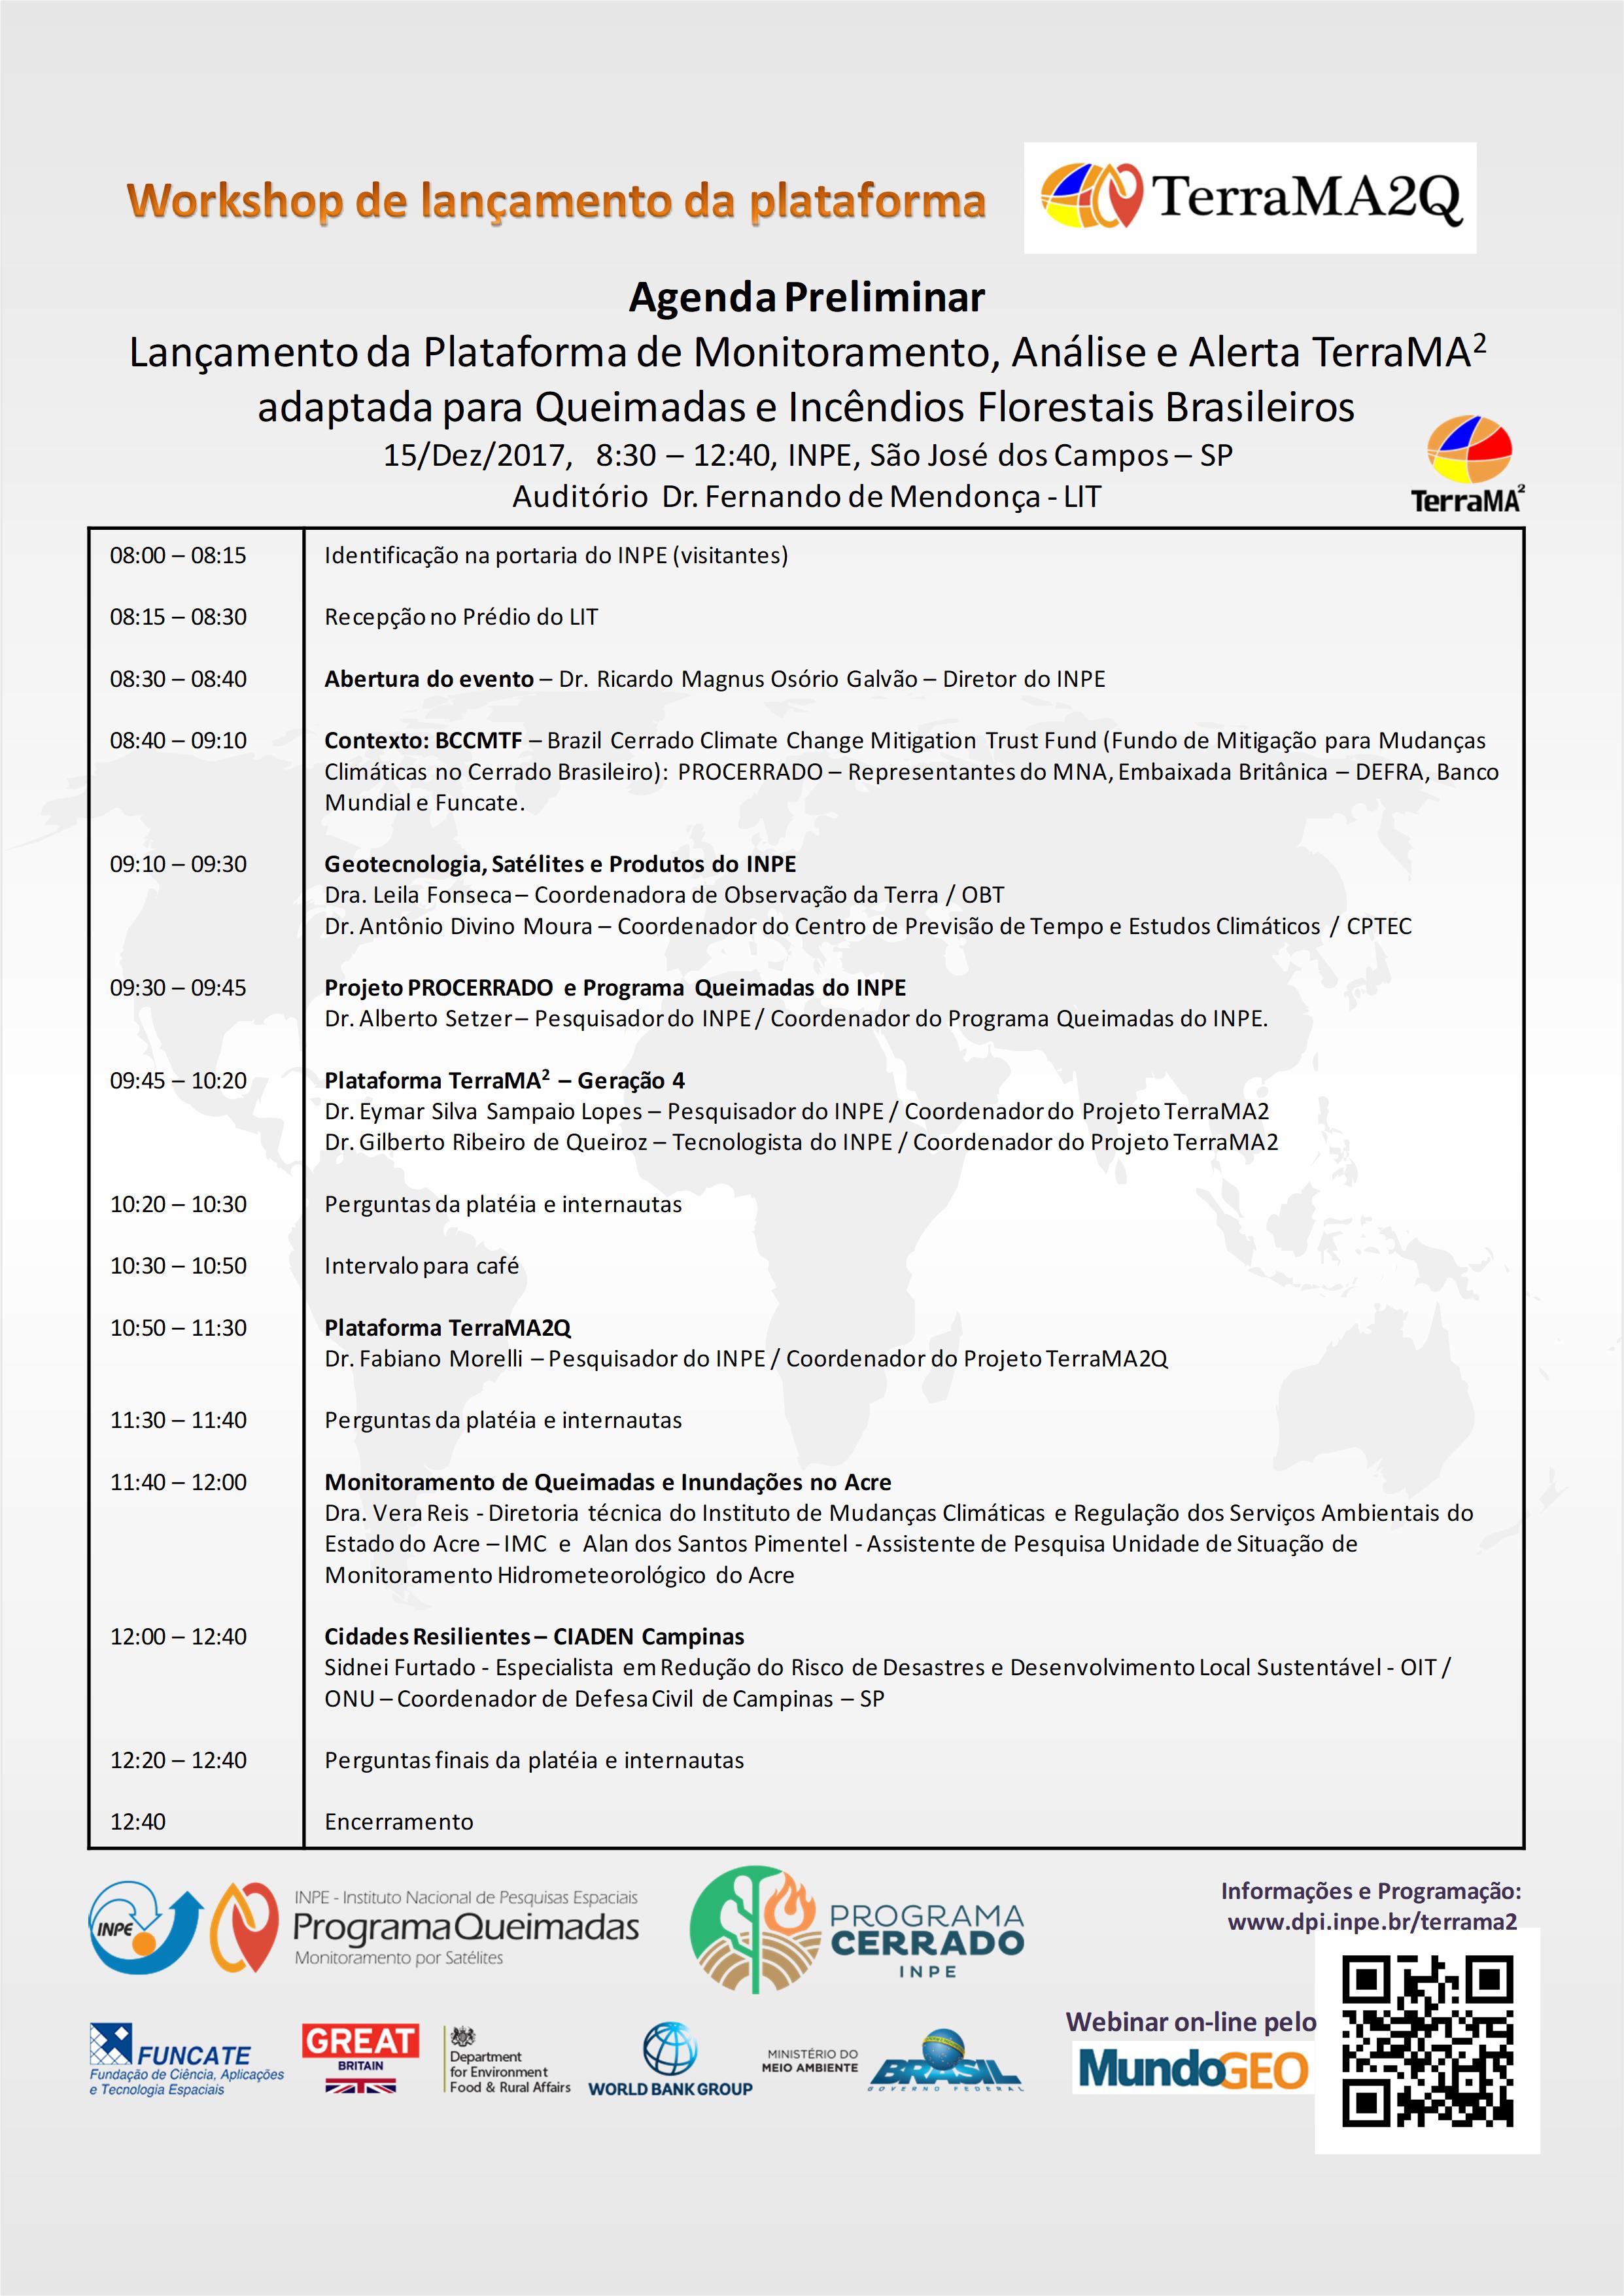 Agenda LancamTerraMA21 Inpe convida para lançamento da plataforma TerraMA2